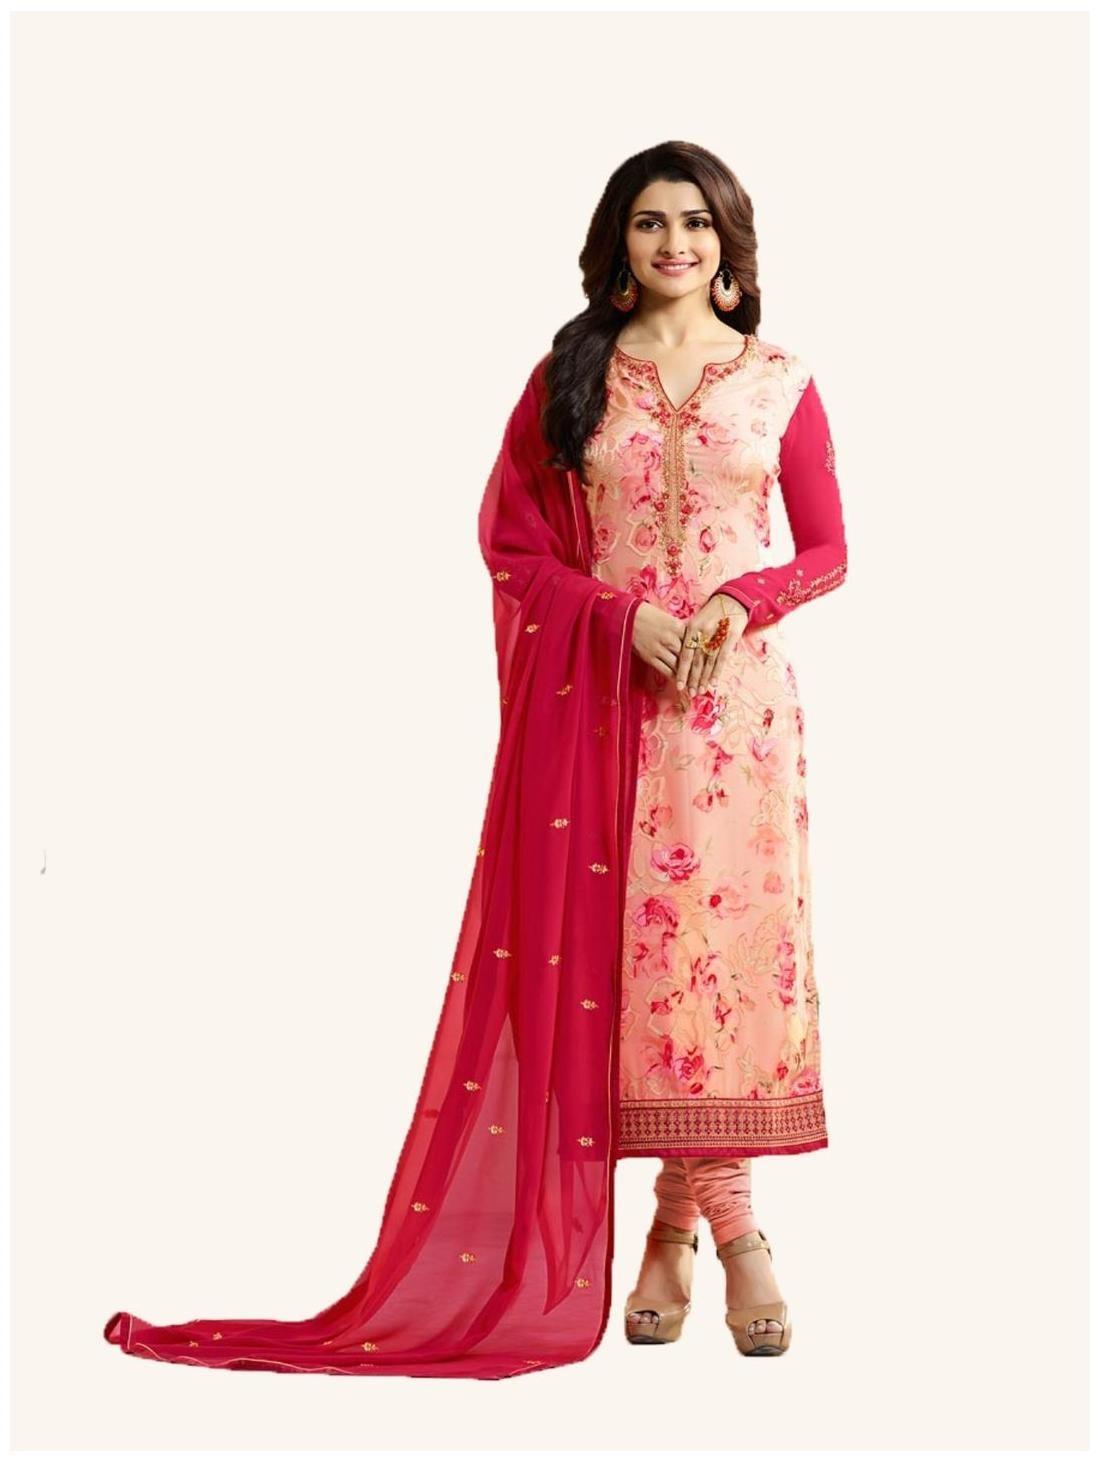 7b6c7ae0dc https://assetscdn1.paytm.com/images/catalog/product/. prachi desai peach  and pink Glorious magicle brasho Glorious Floral Work biege Pakistani  Straight ...